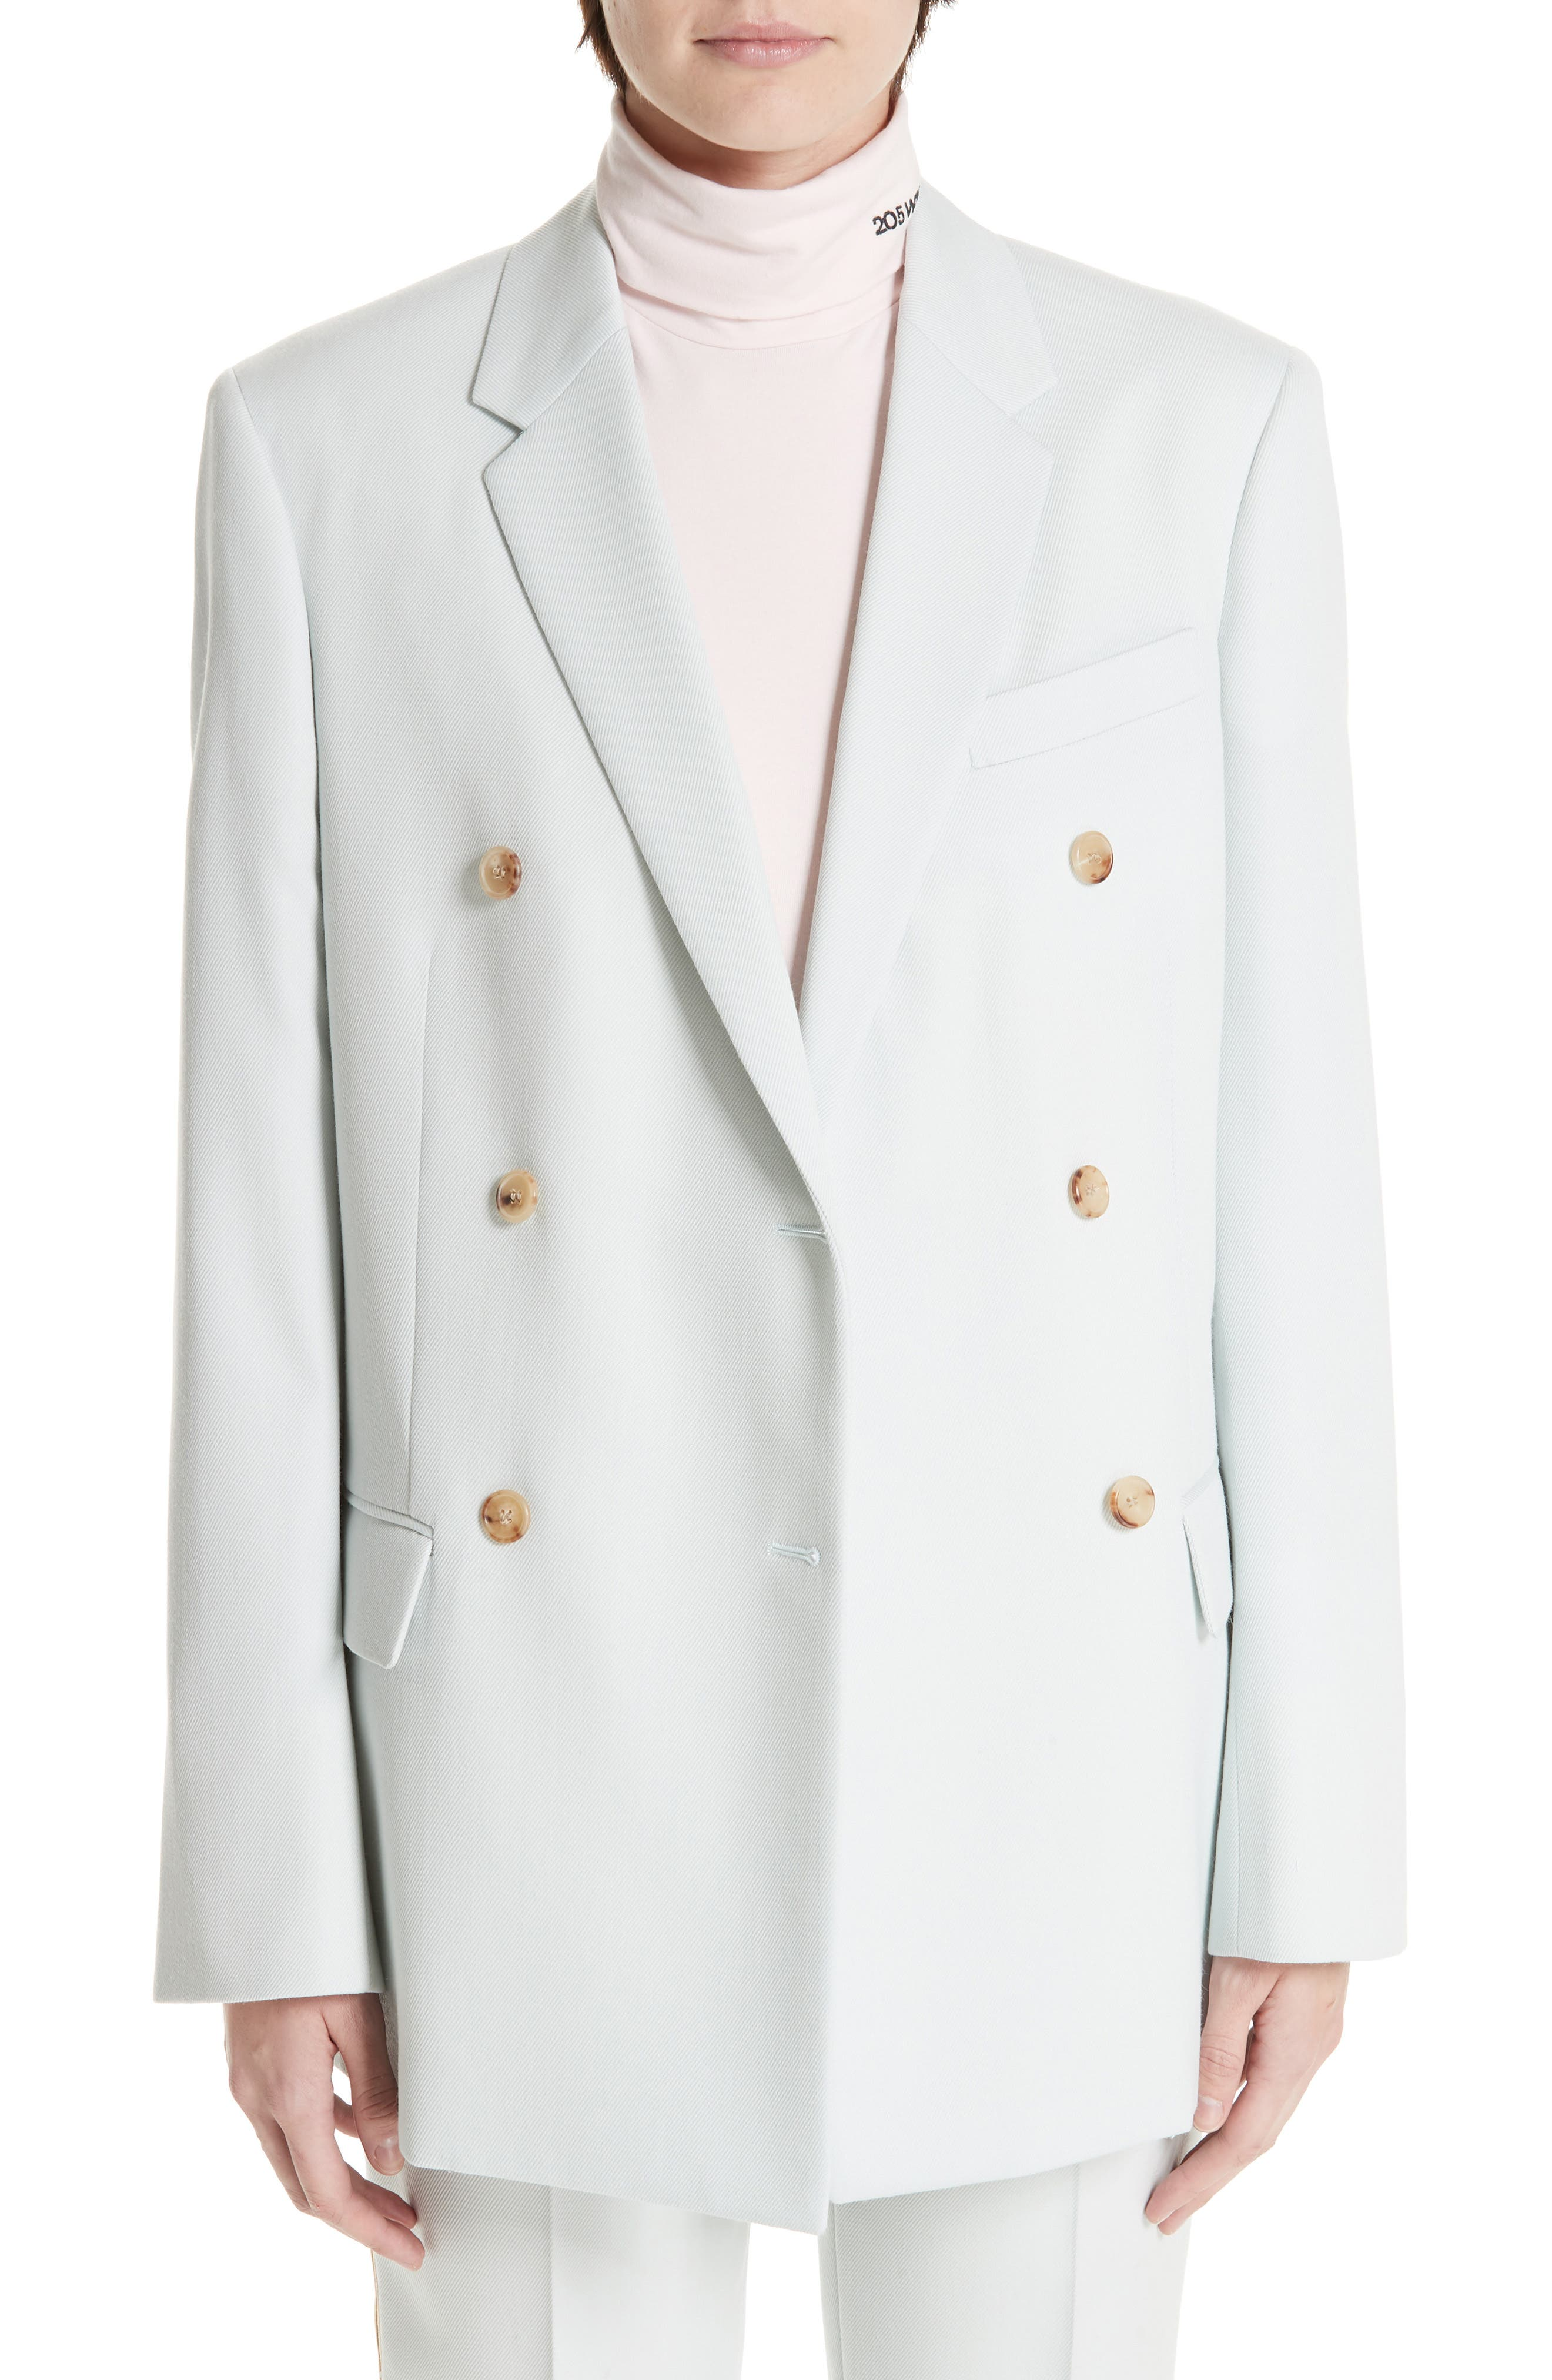 Wool Twill Double Breasted Blazer,                             Main thumbnail 1, color,                             LIGHT AQUA